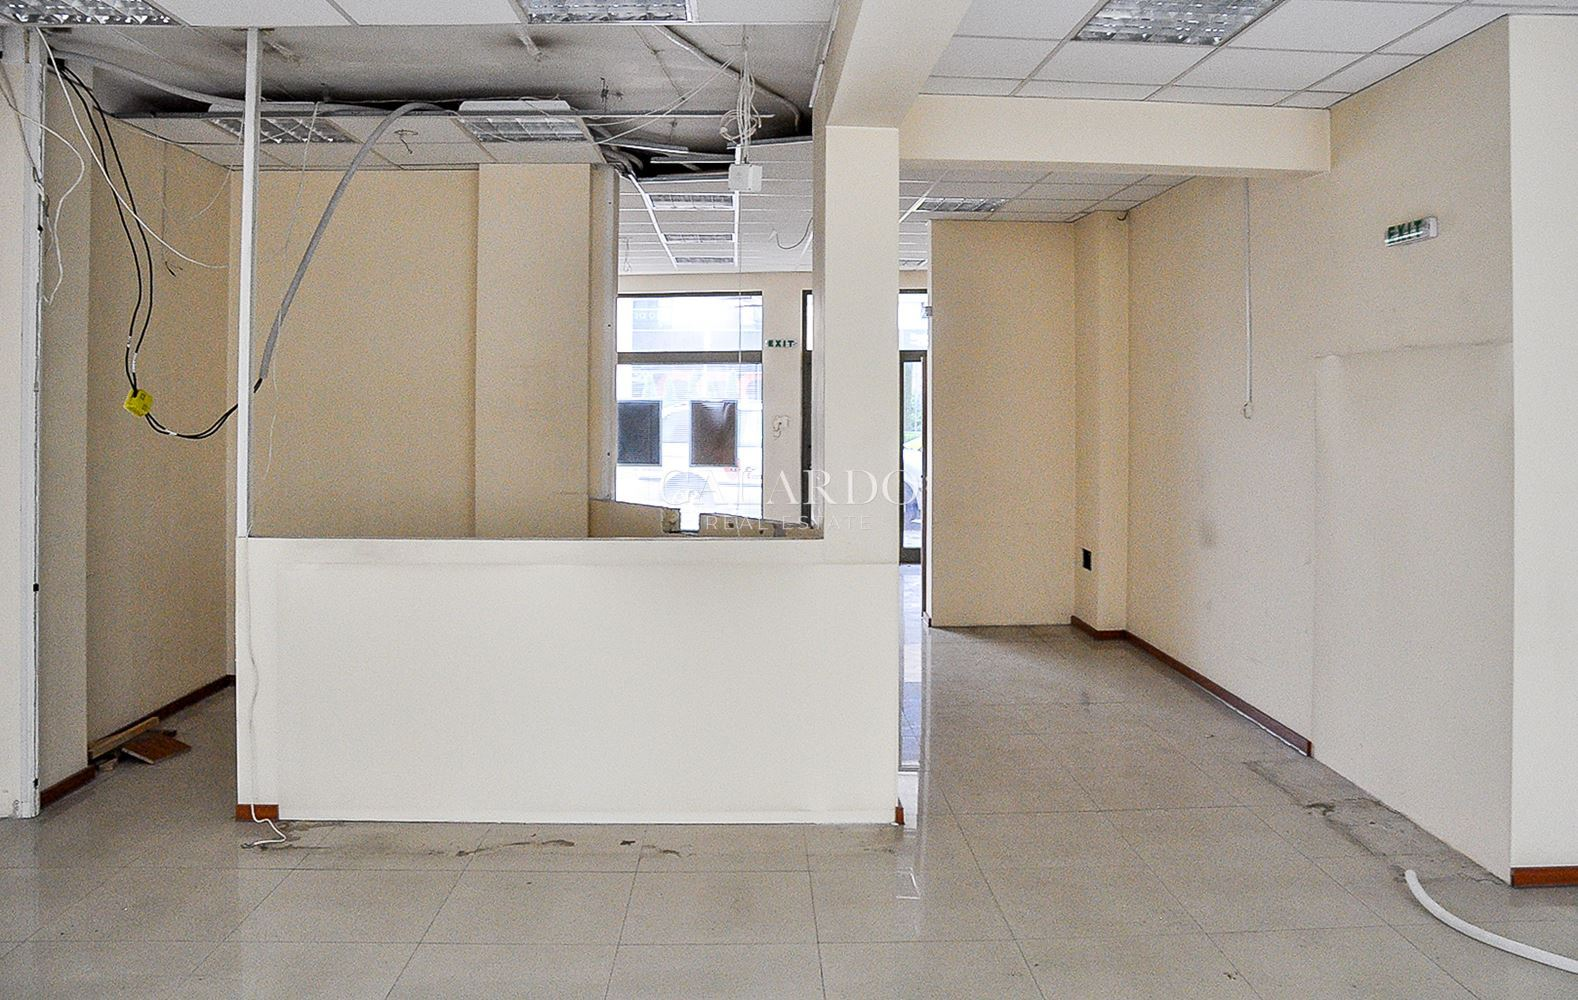 Ground floor office space next to City Center